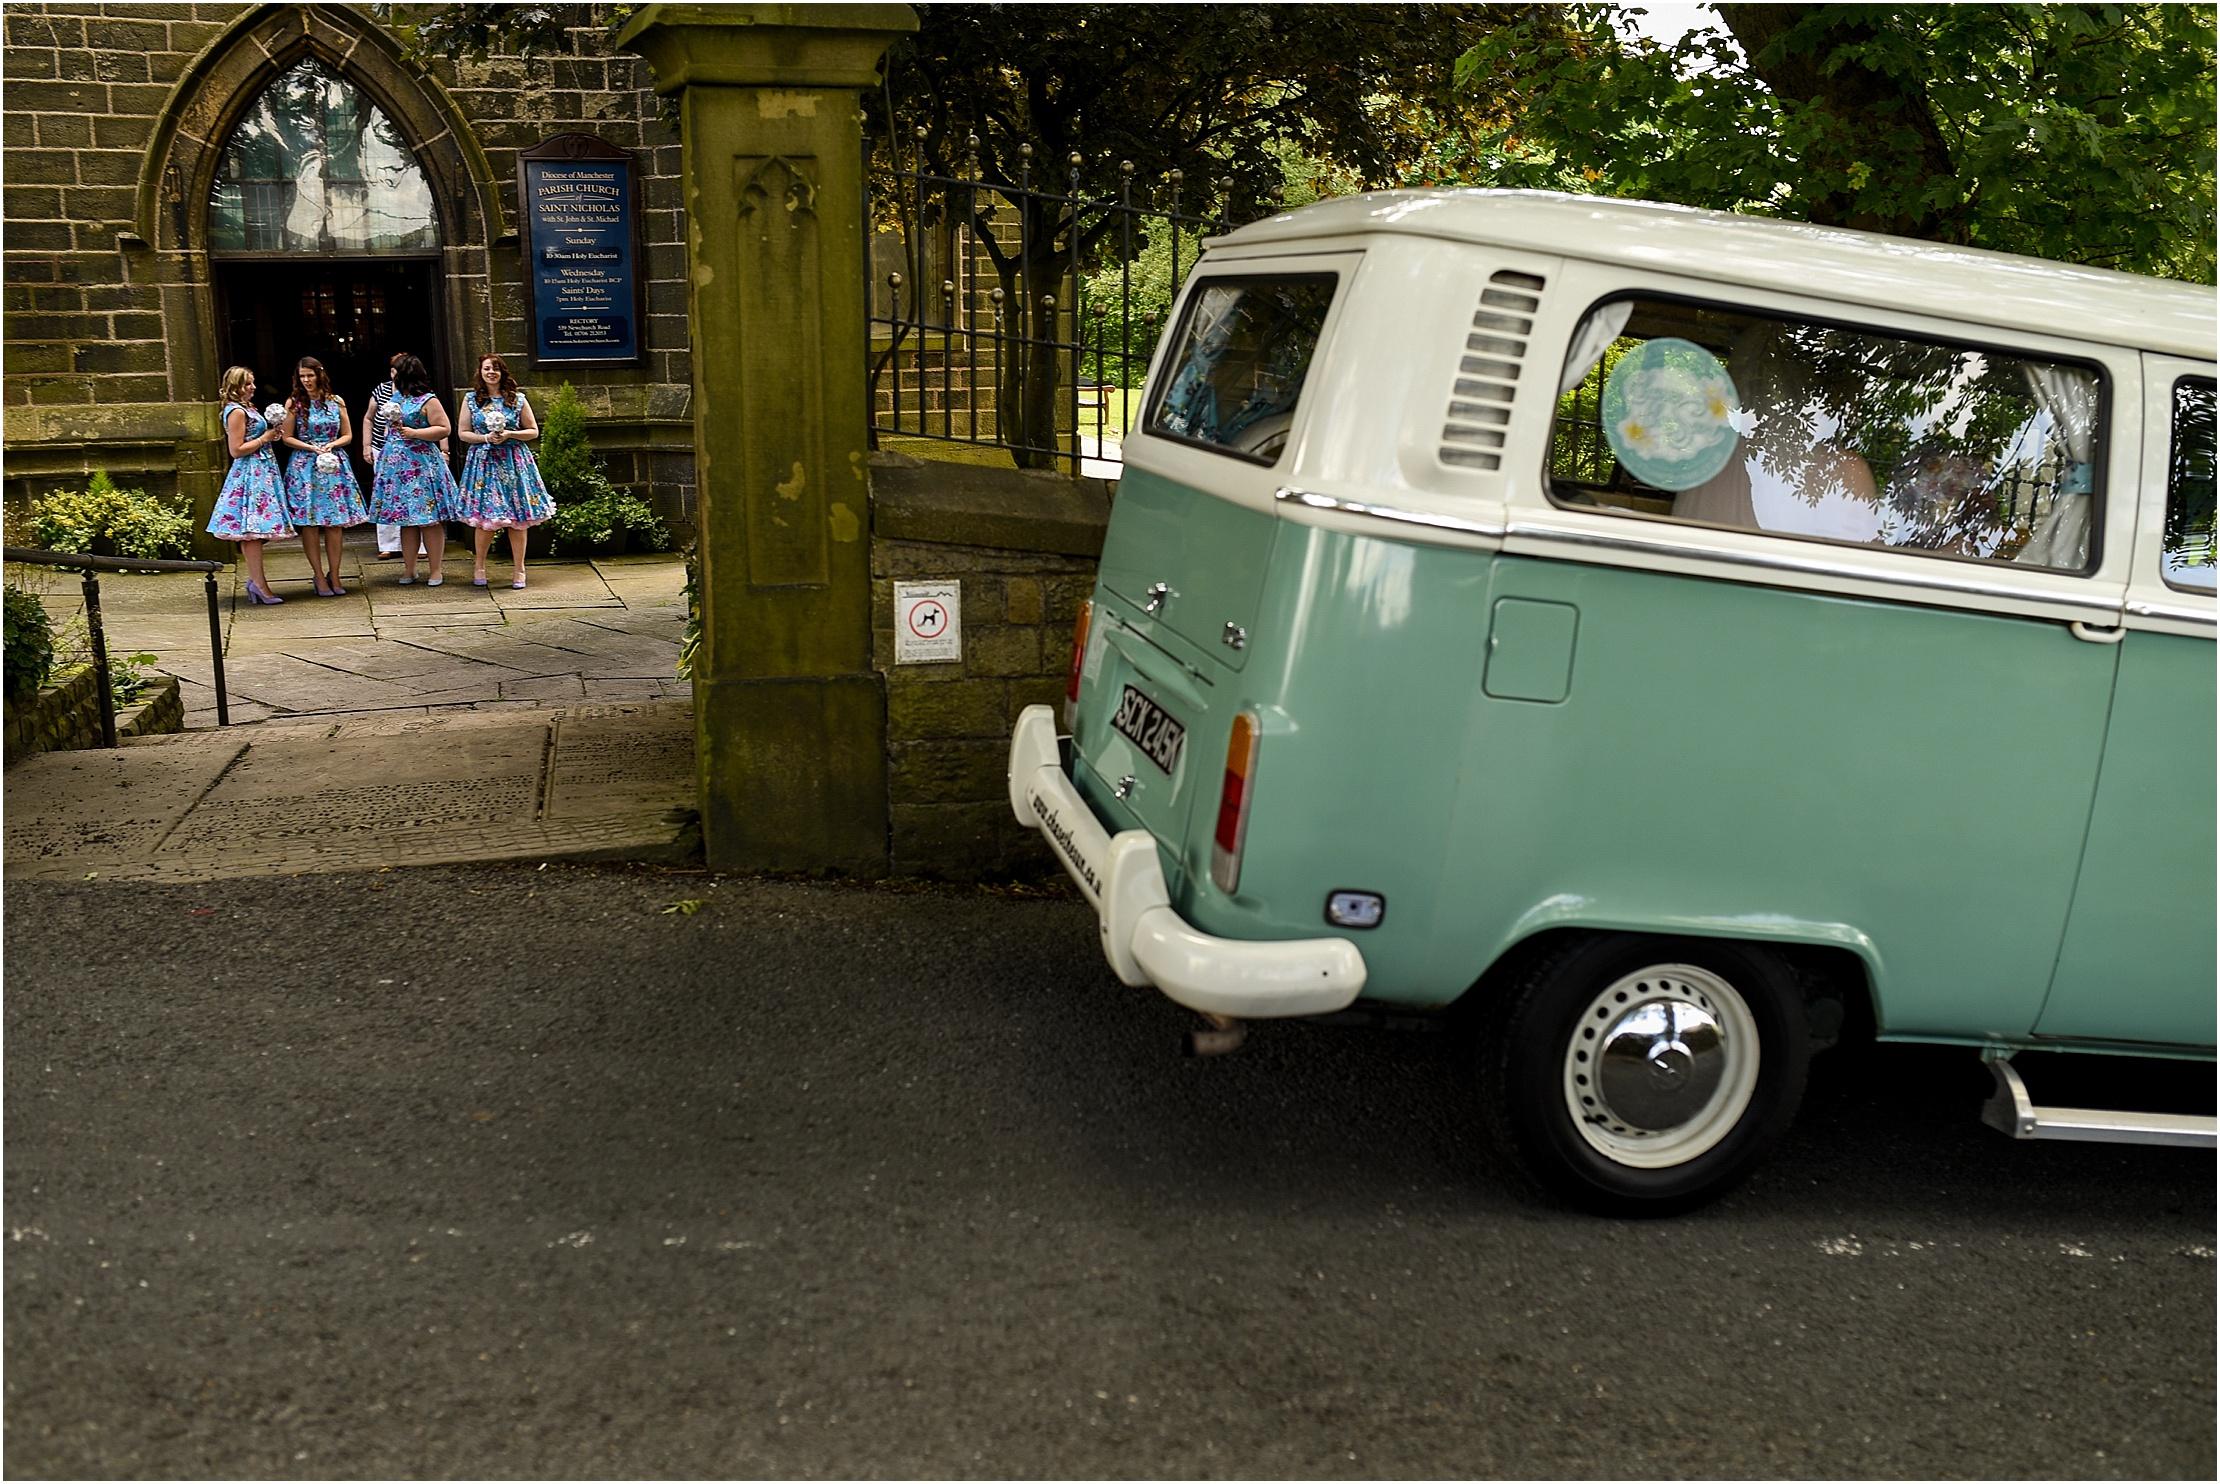 shireburn-arms-wedding- 043.jpg